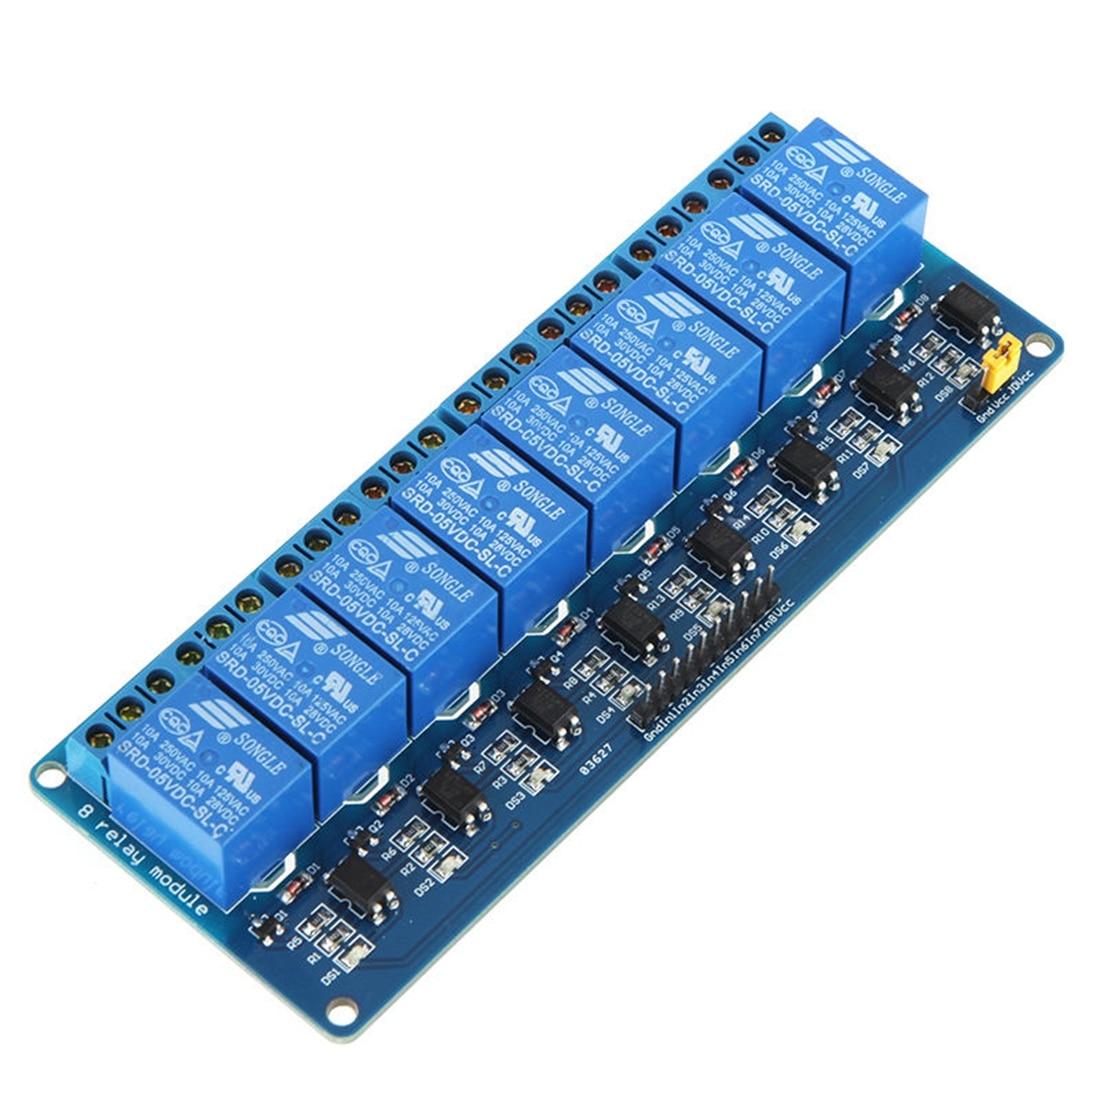 KSOL 5V 8 Channel Relay Module Board For Arduino AVR PIC MCU DSP ARM 8 channel 12v relay module board